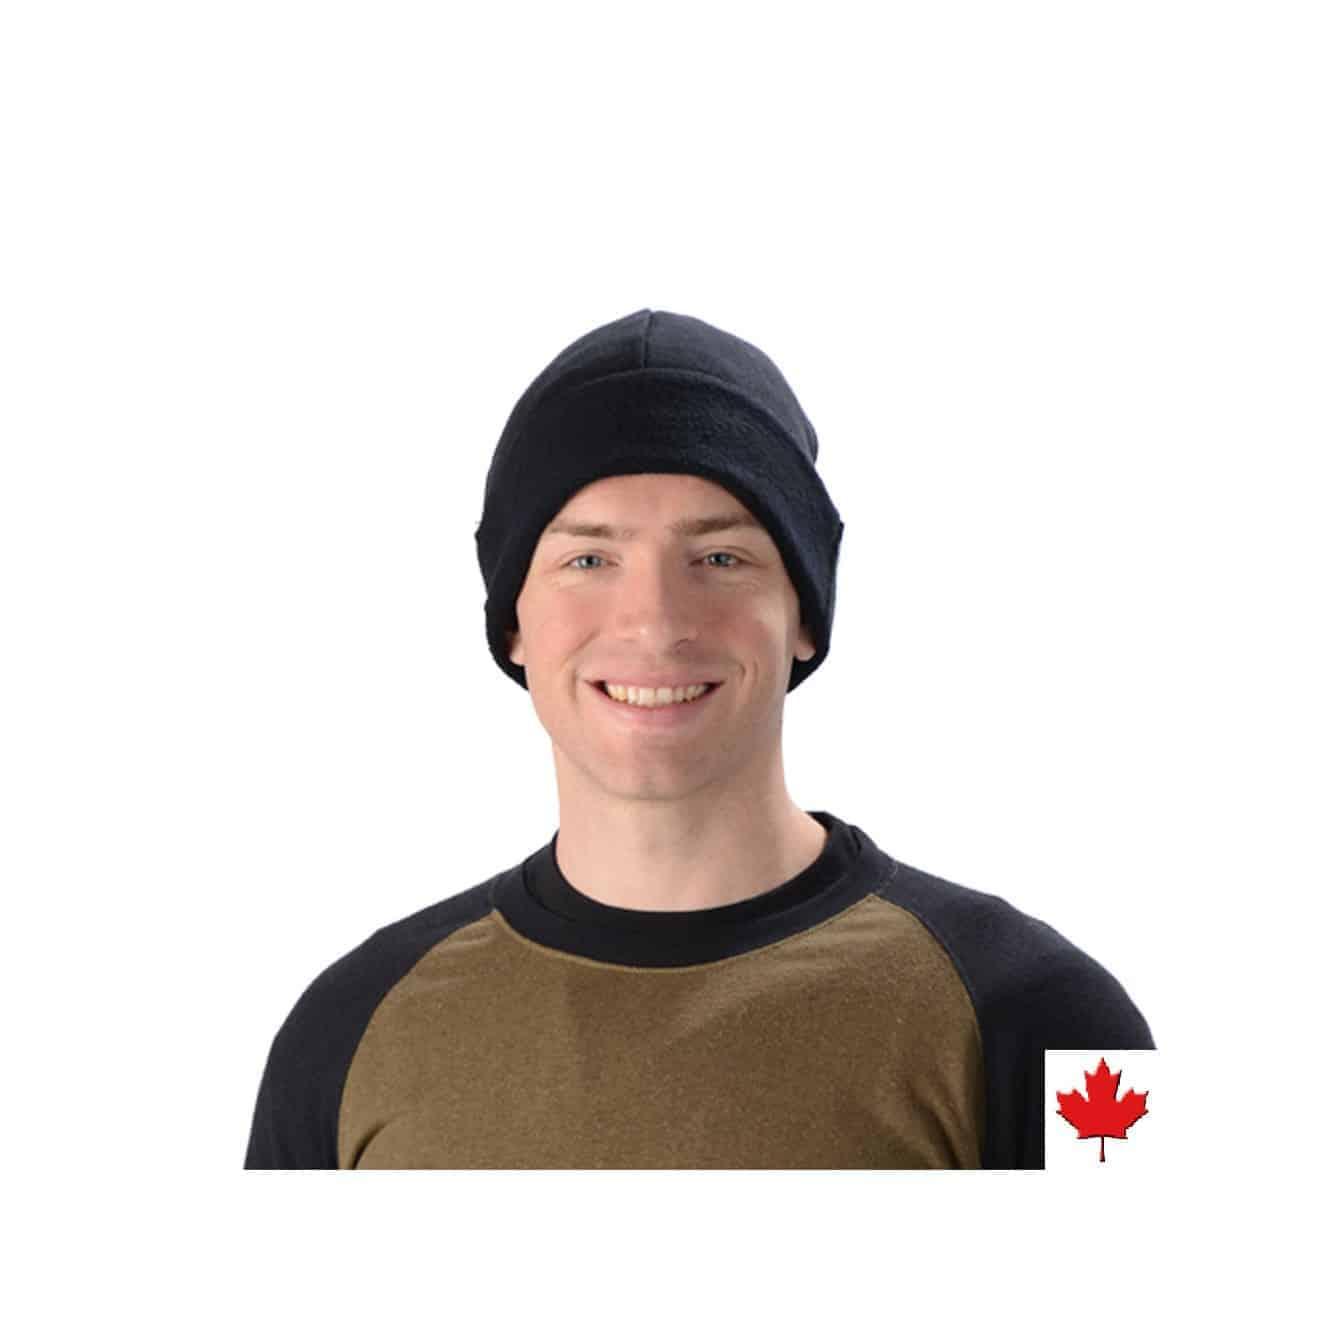 36dcb94f308 Men s Hemp Beanie Toque - Made in Canada